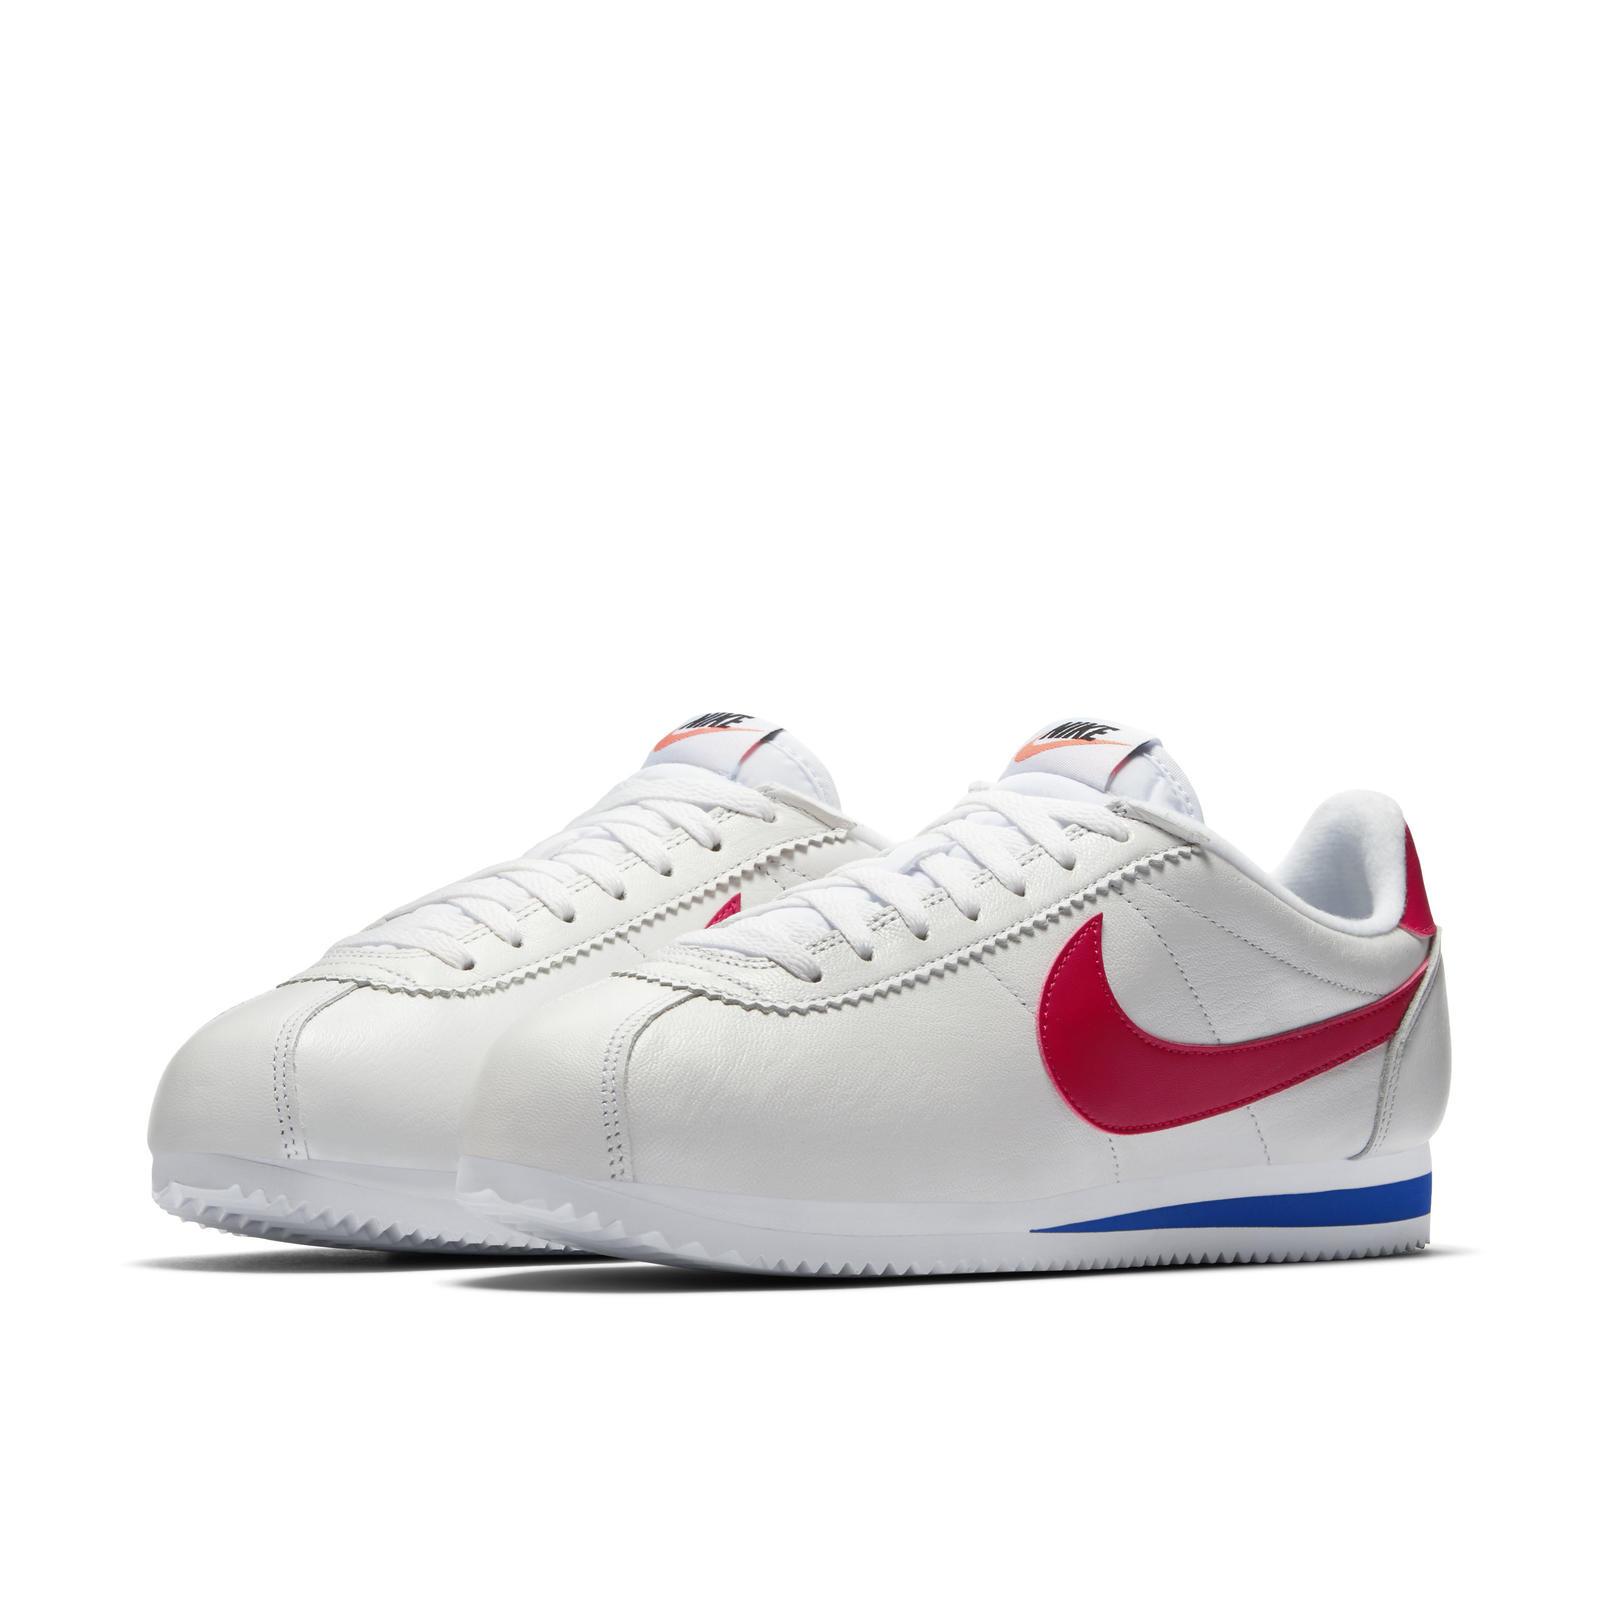 Iconic Ladies Nike Shoes